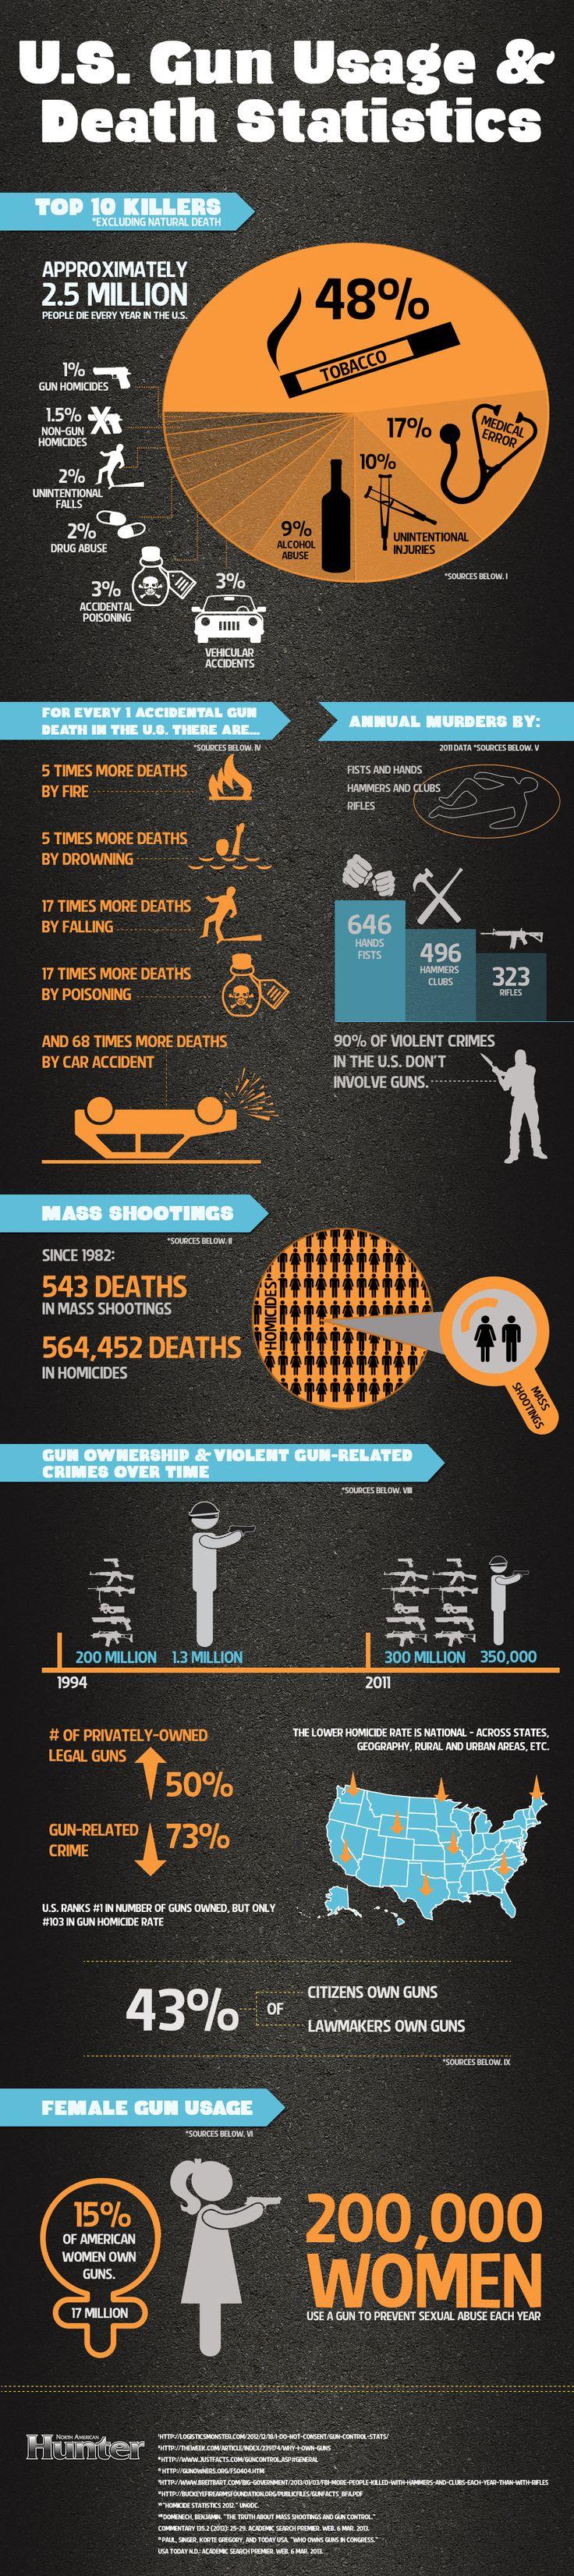 U.S. Gun Usage & Death Statistics